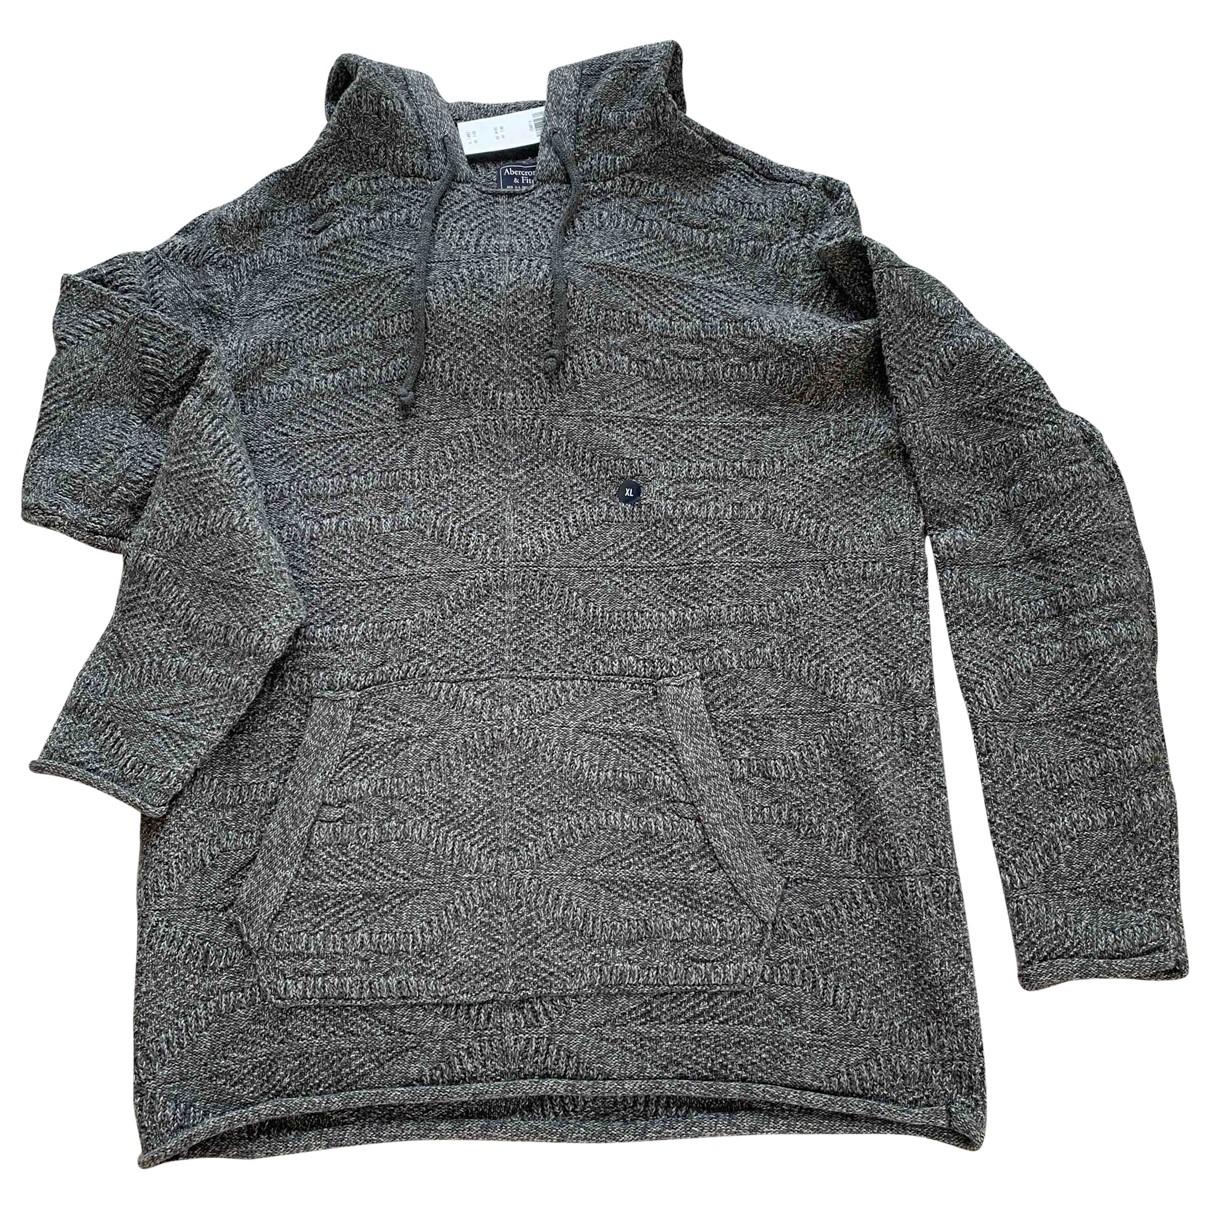 Abercrombie & Fitch \N Grey Cotton Knitwear & Sweatshirts for Men XL International